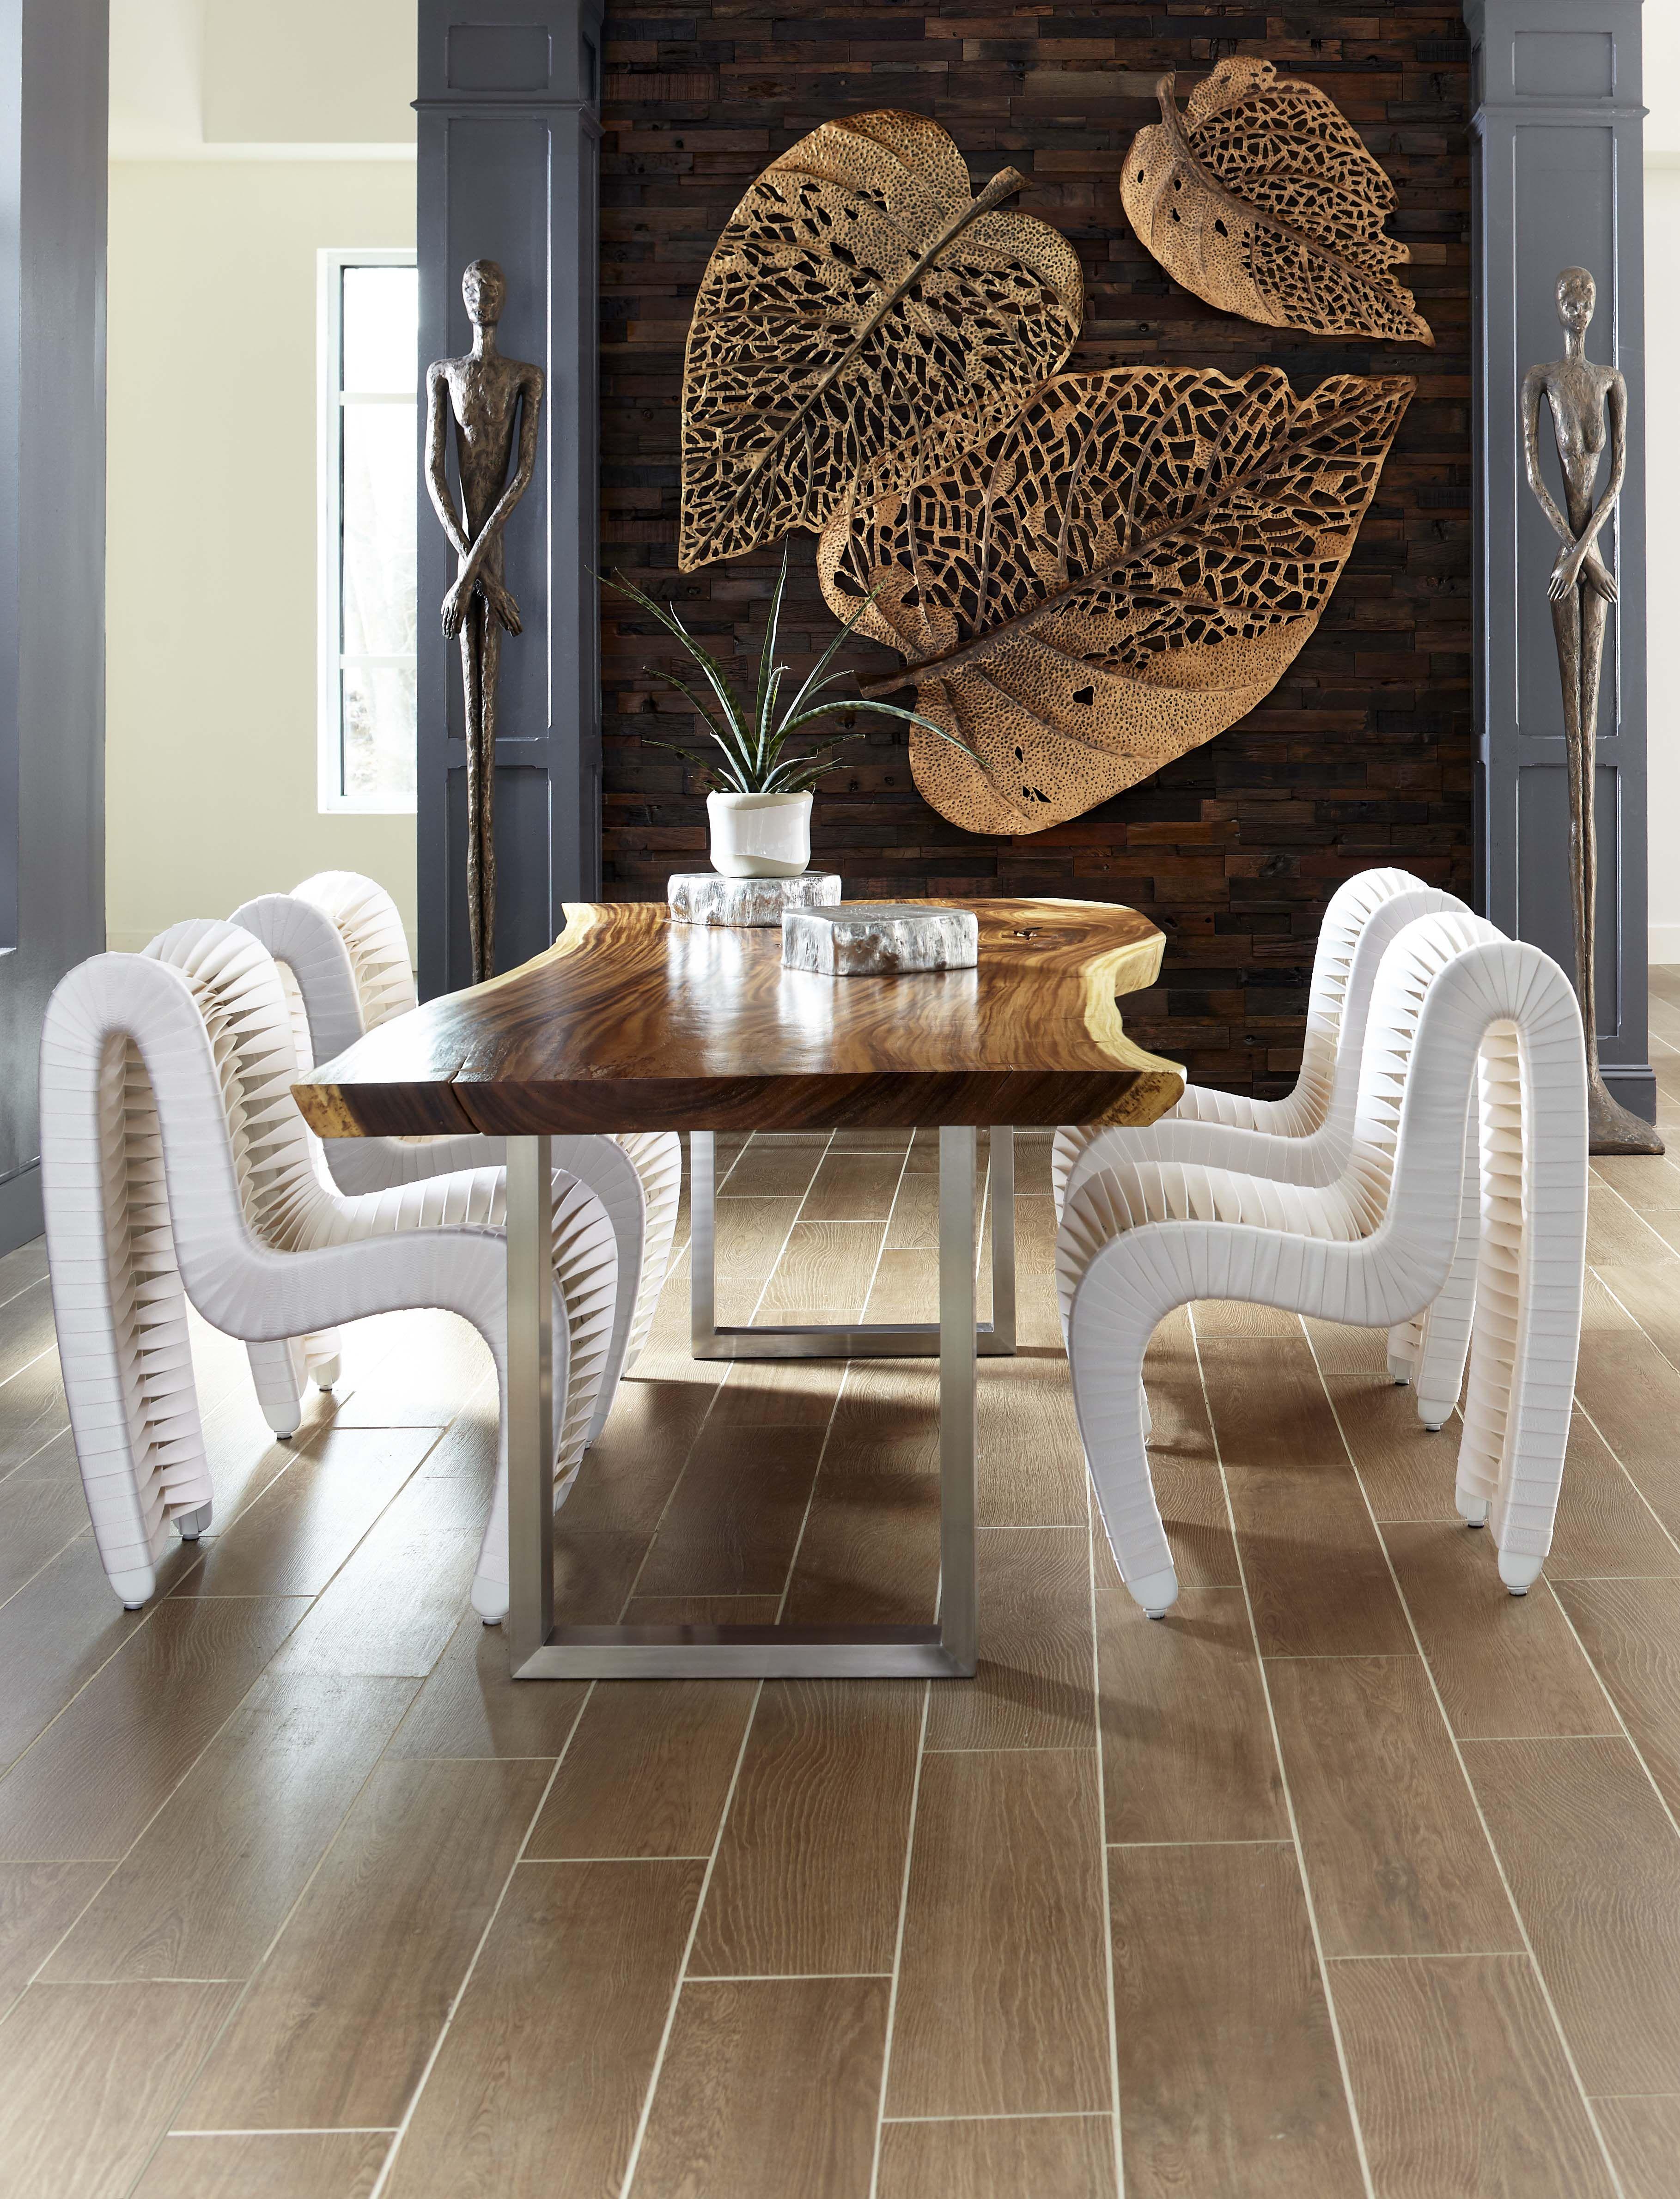 Birch Leaf Wall Art Copper Lg Living Room Wall Designs House Interior Decor Interior